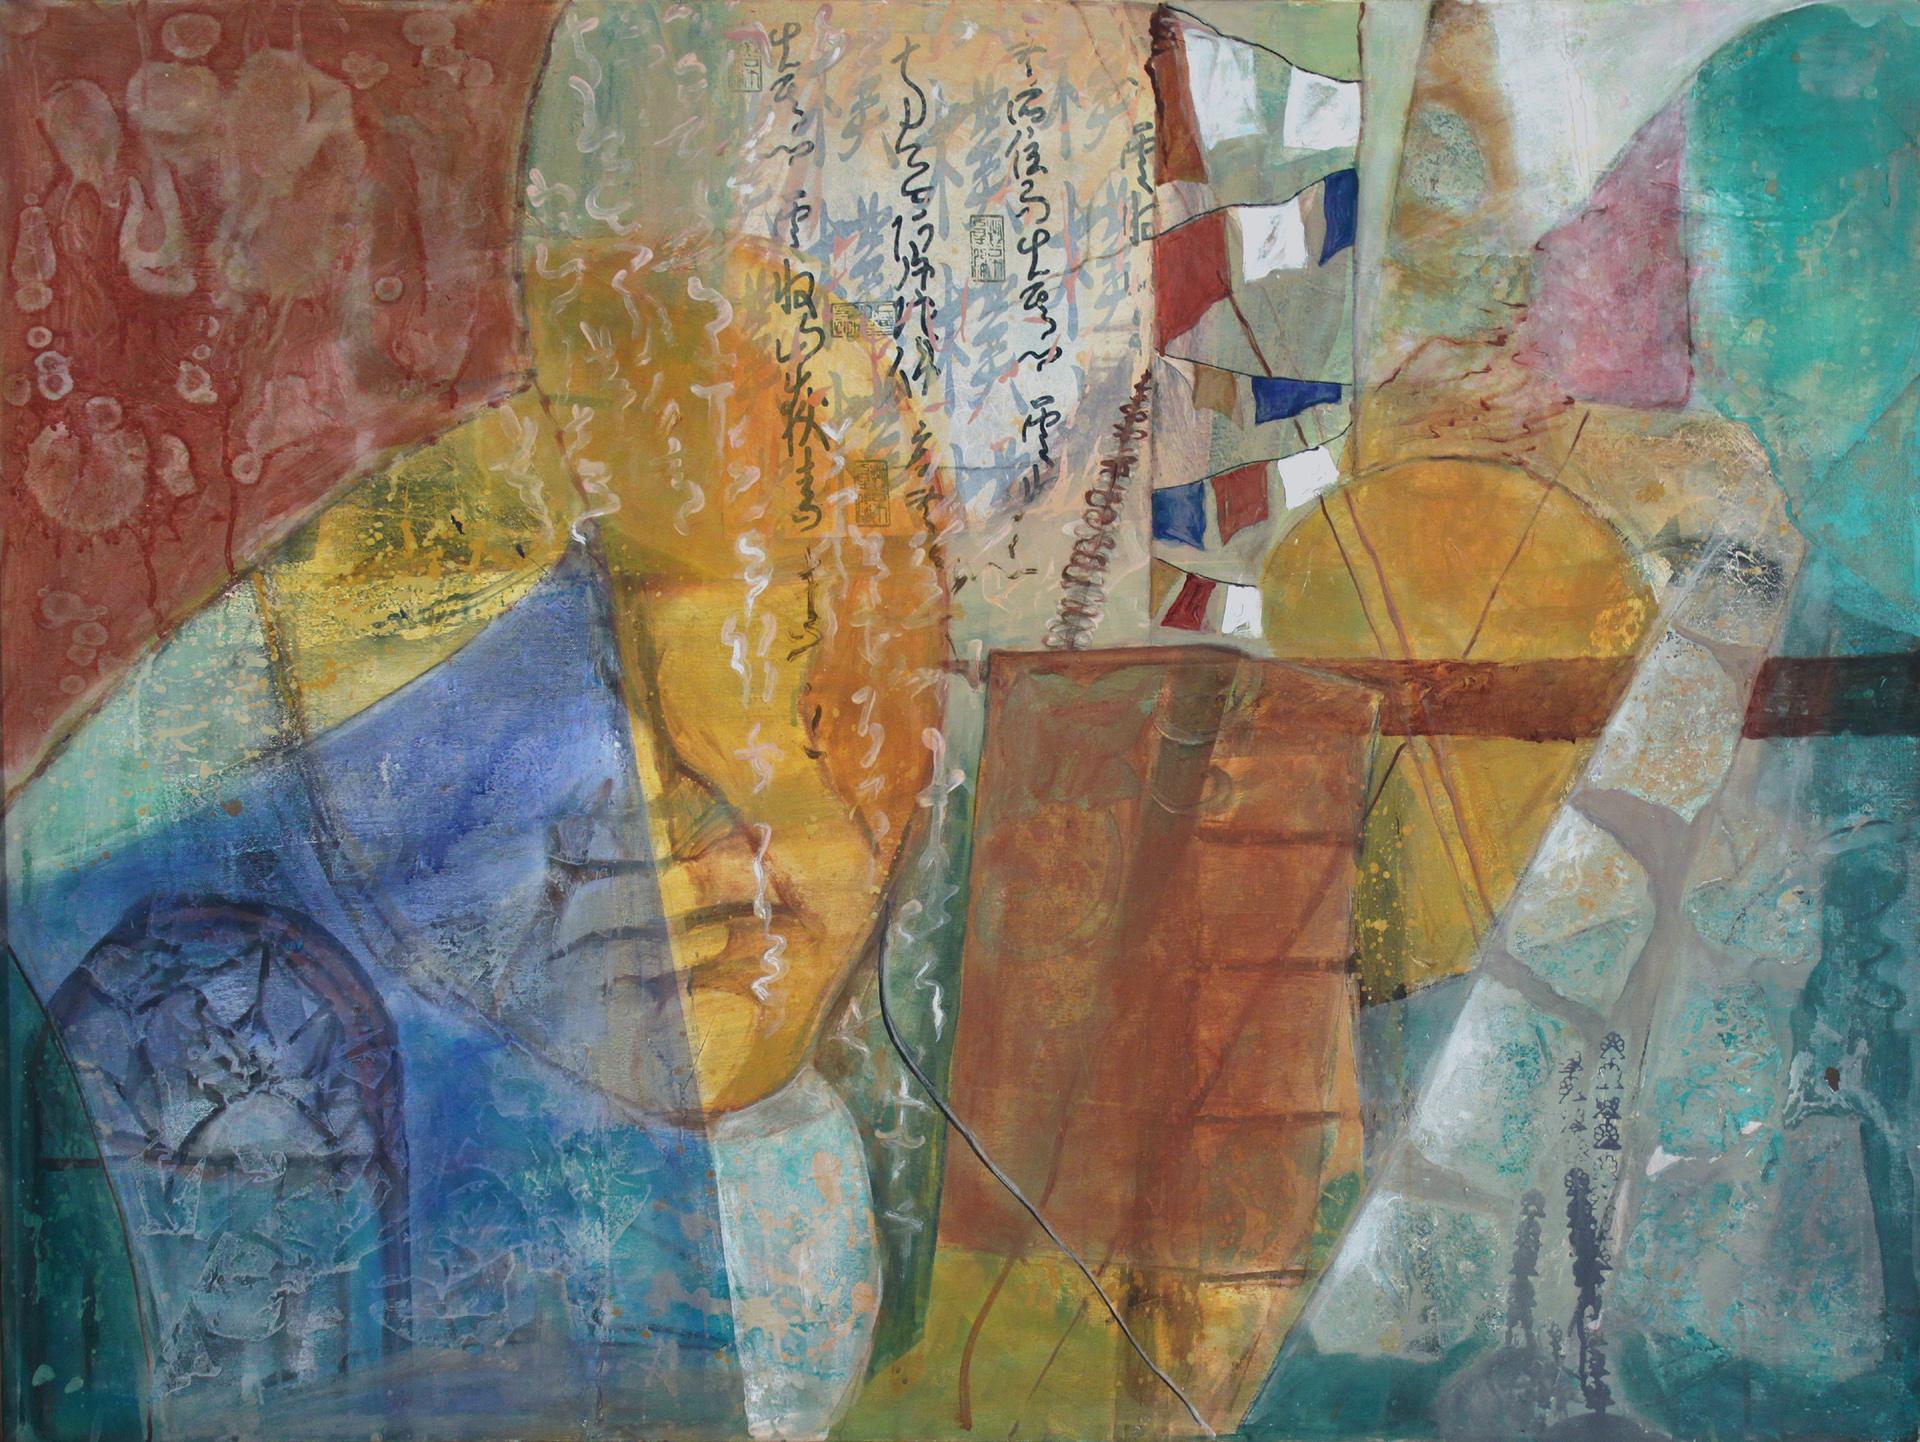 Behind the Prayers, 36x48, oil on canvas, 2014